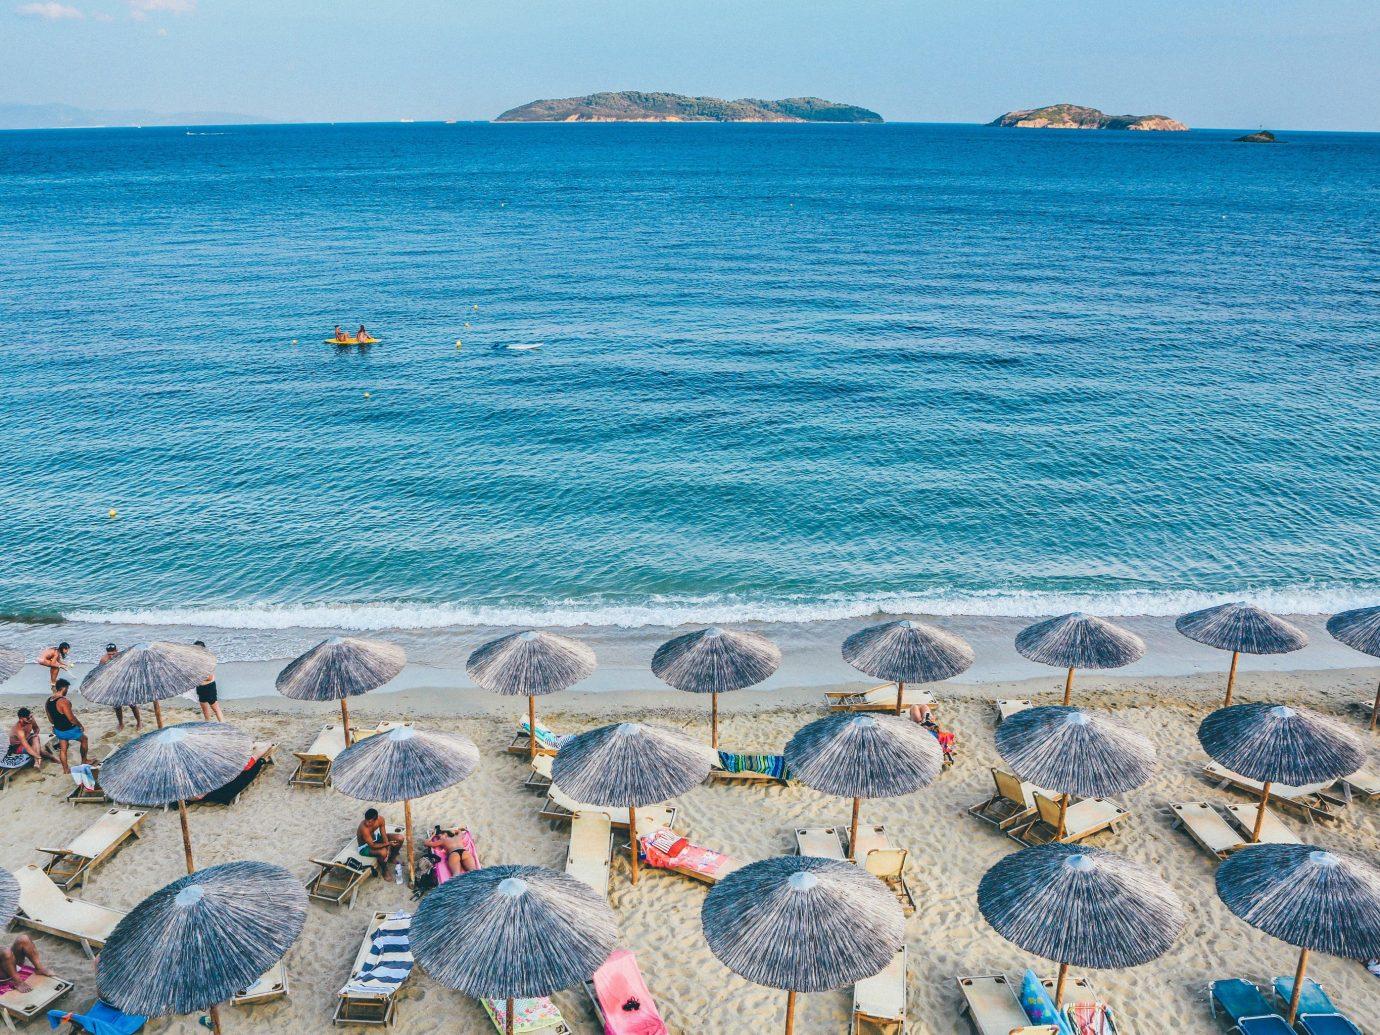 Trip Ideas water sky outdoor Sea shore Beach body of water Ocean vacation Coast cape people bay sand sandy